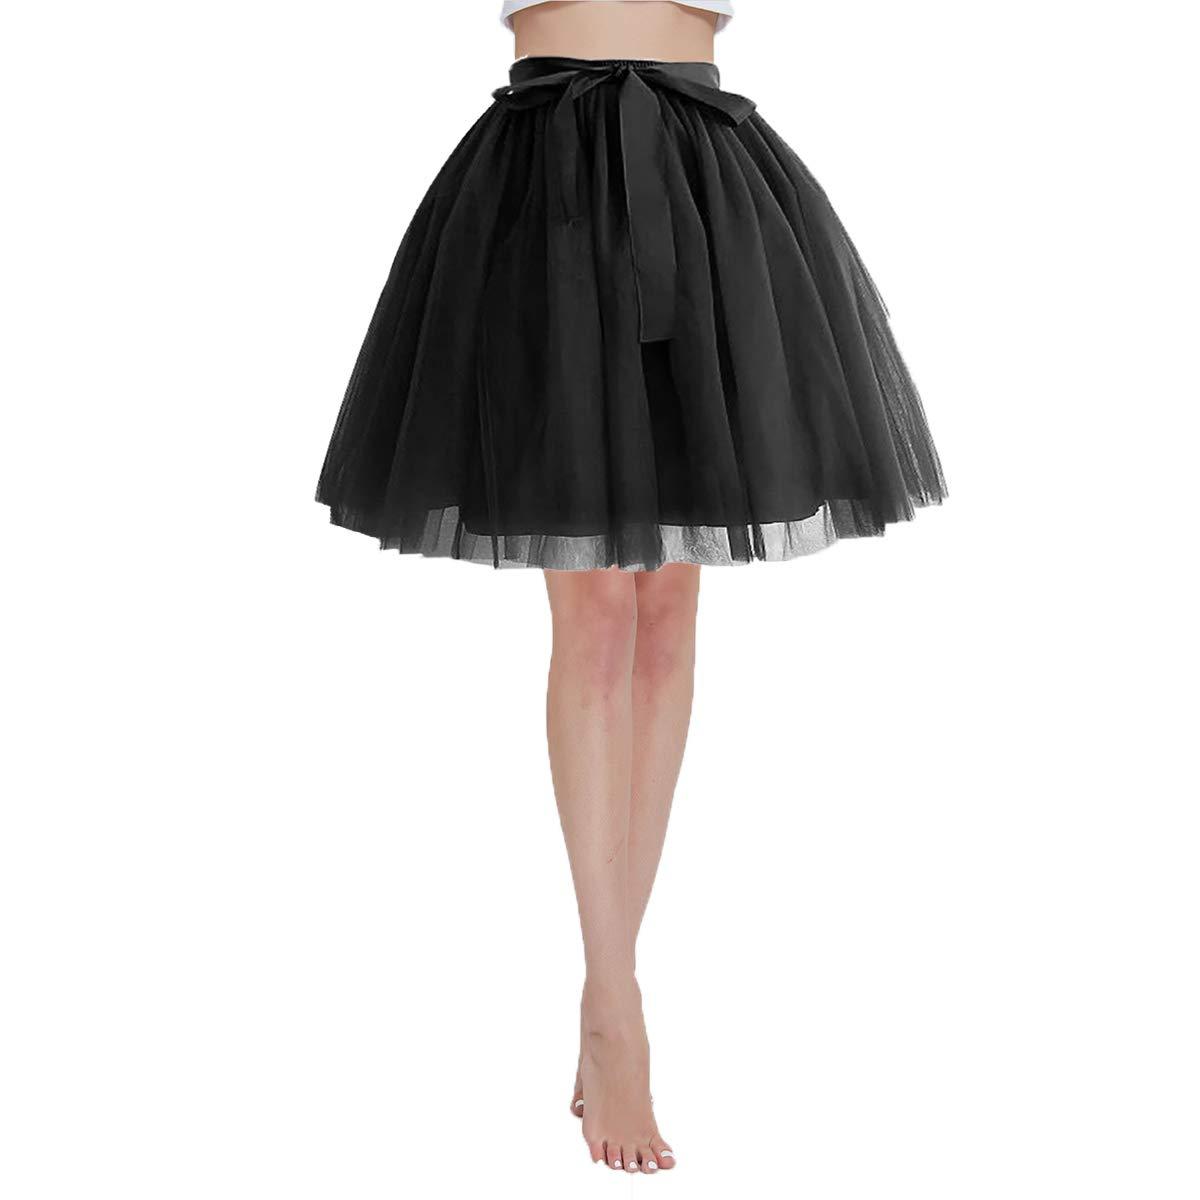 Women's High Waist Princess Tulle Skirt Adult Dance Petticoat A-line Short Wedding Party Tutu